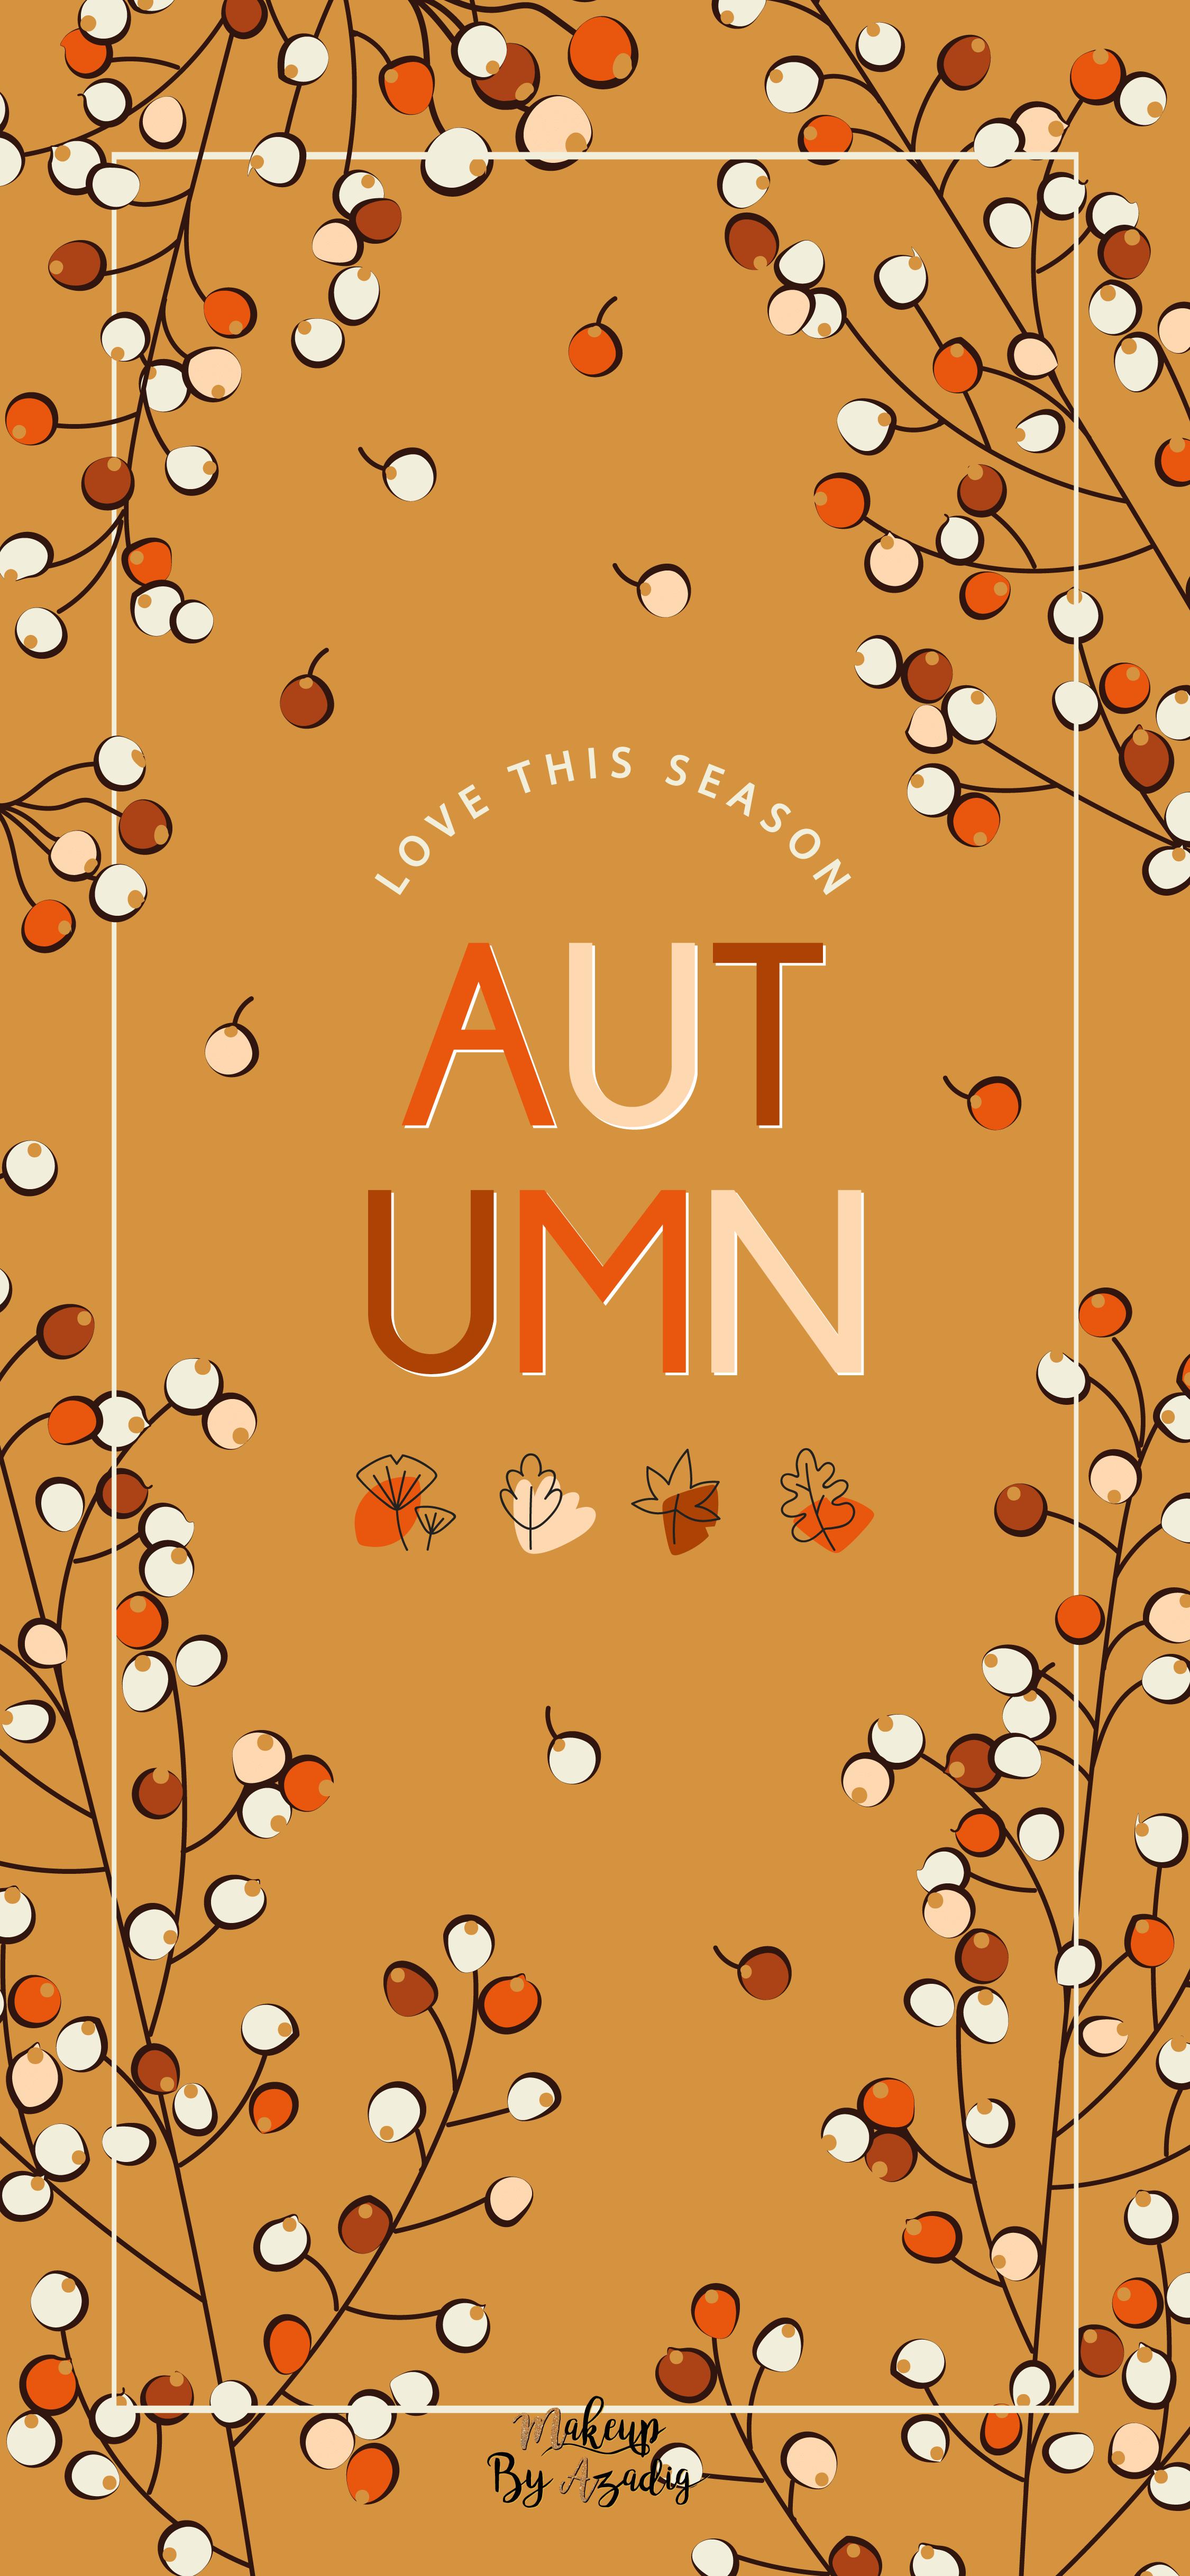 fond-decran-wallpaper-automne-leaves-autumn-season-iphone-samsung-huawai-makeupbyazadig-tendance